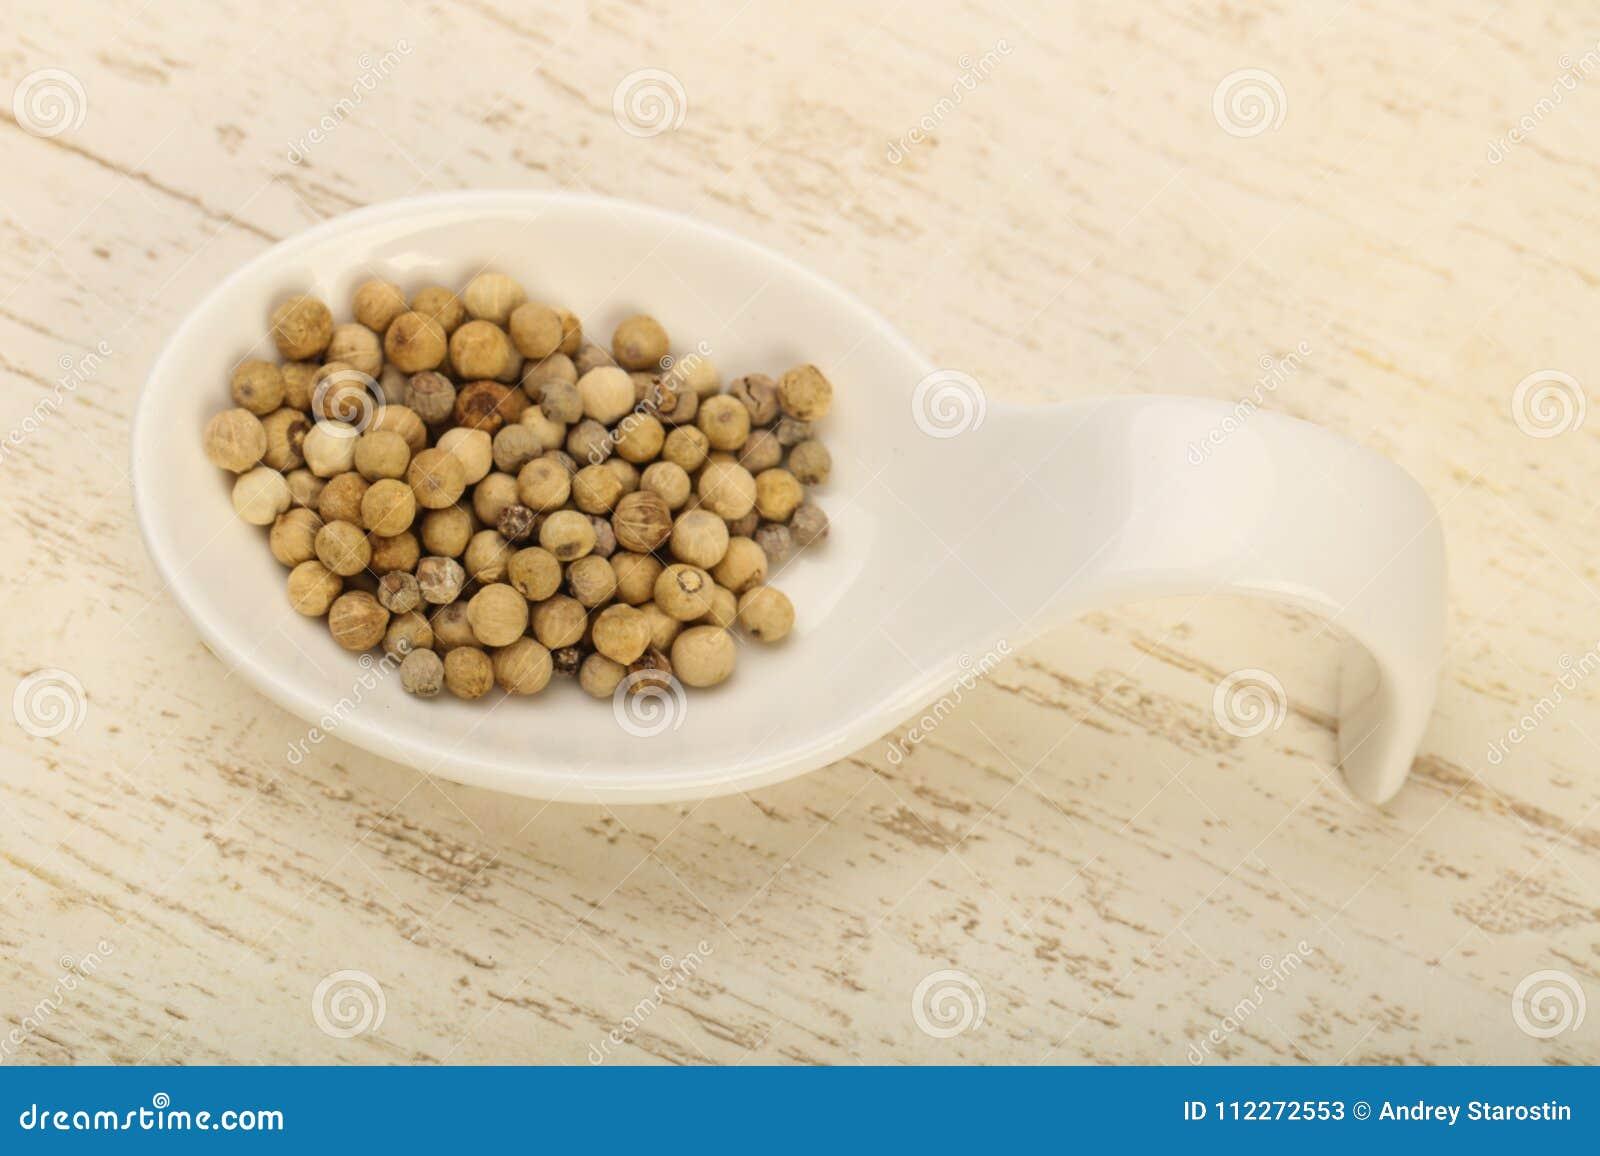 White pepper corn